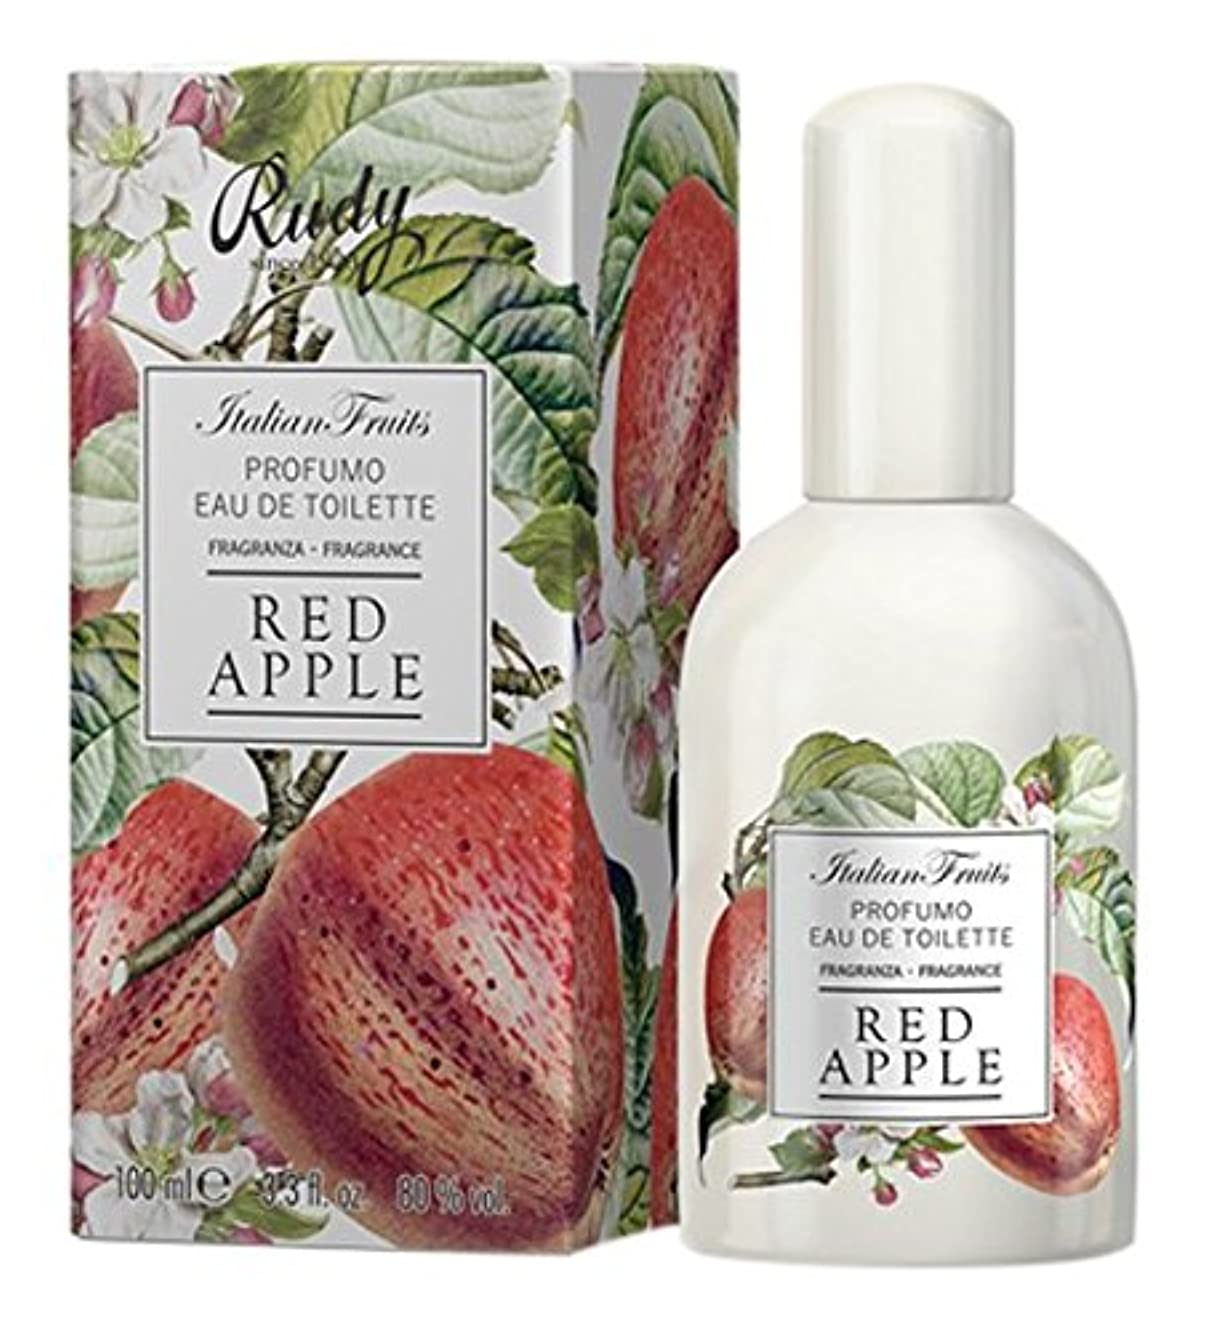 RUDY Italian Fruits Series ルディ イタリアンフルーツ Eau De Toilette オードトワレ Red Apple